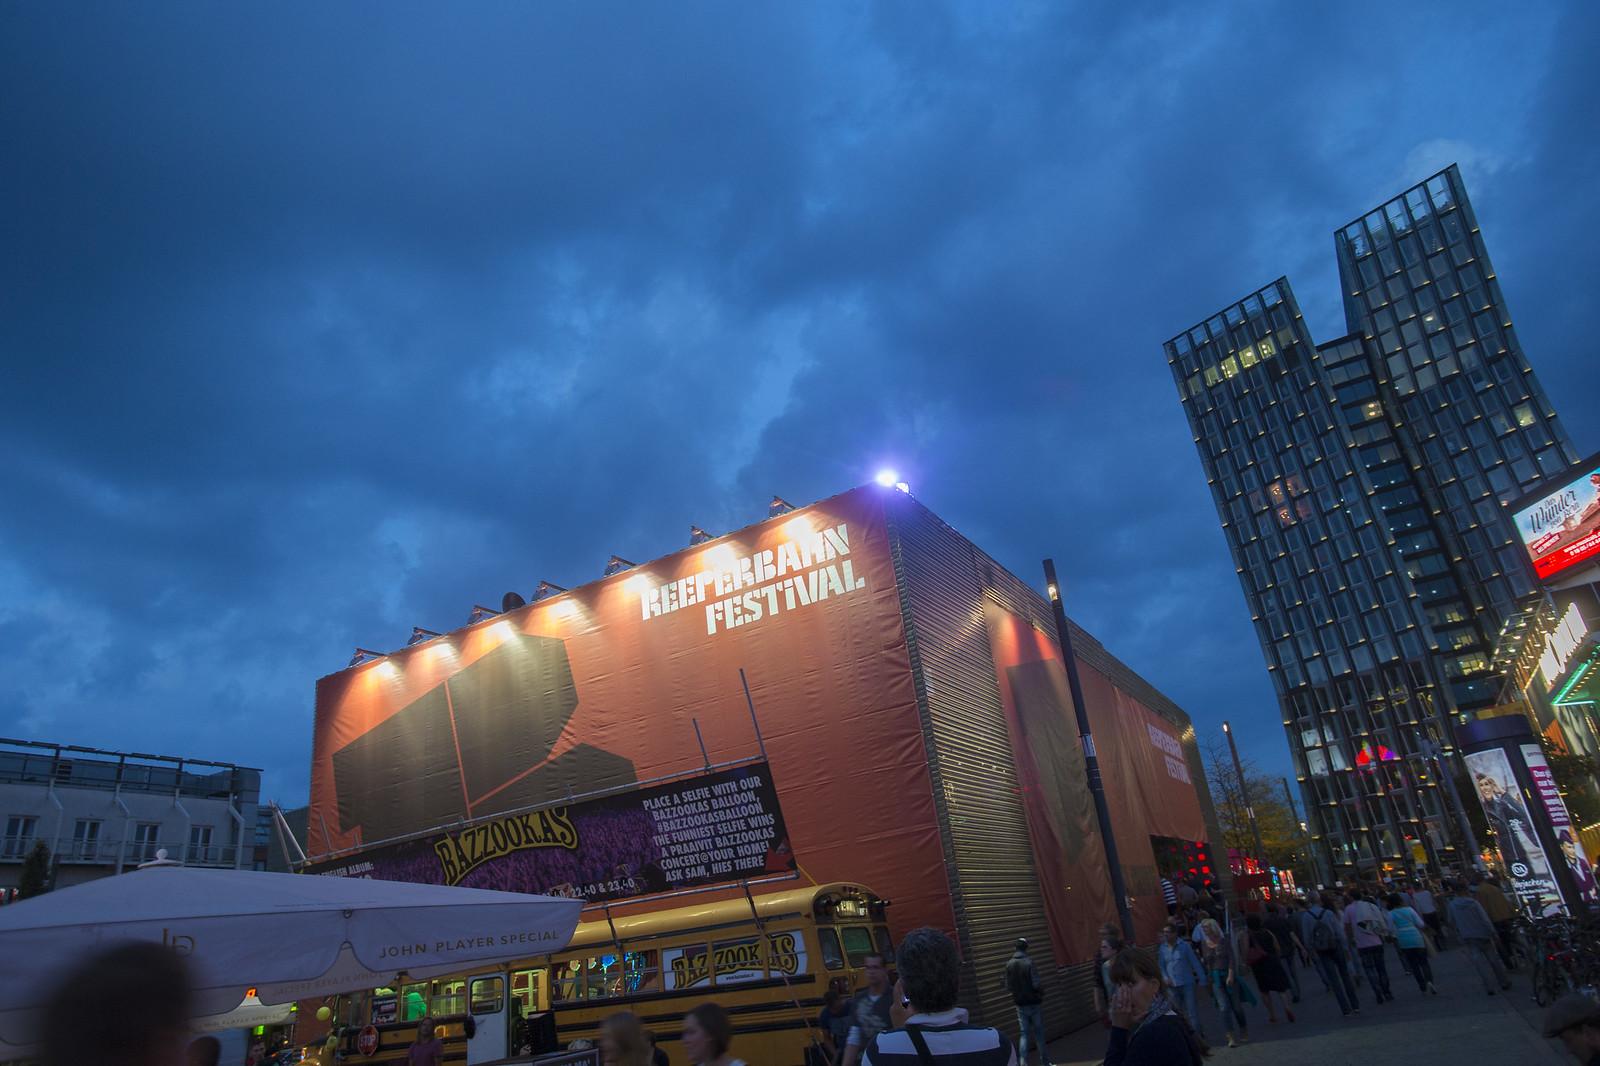 Reeperbahn Festival   Spielbudenplatz Hamburg St. Pauli